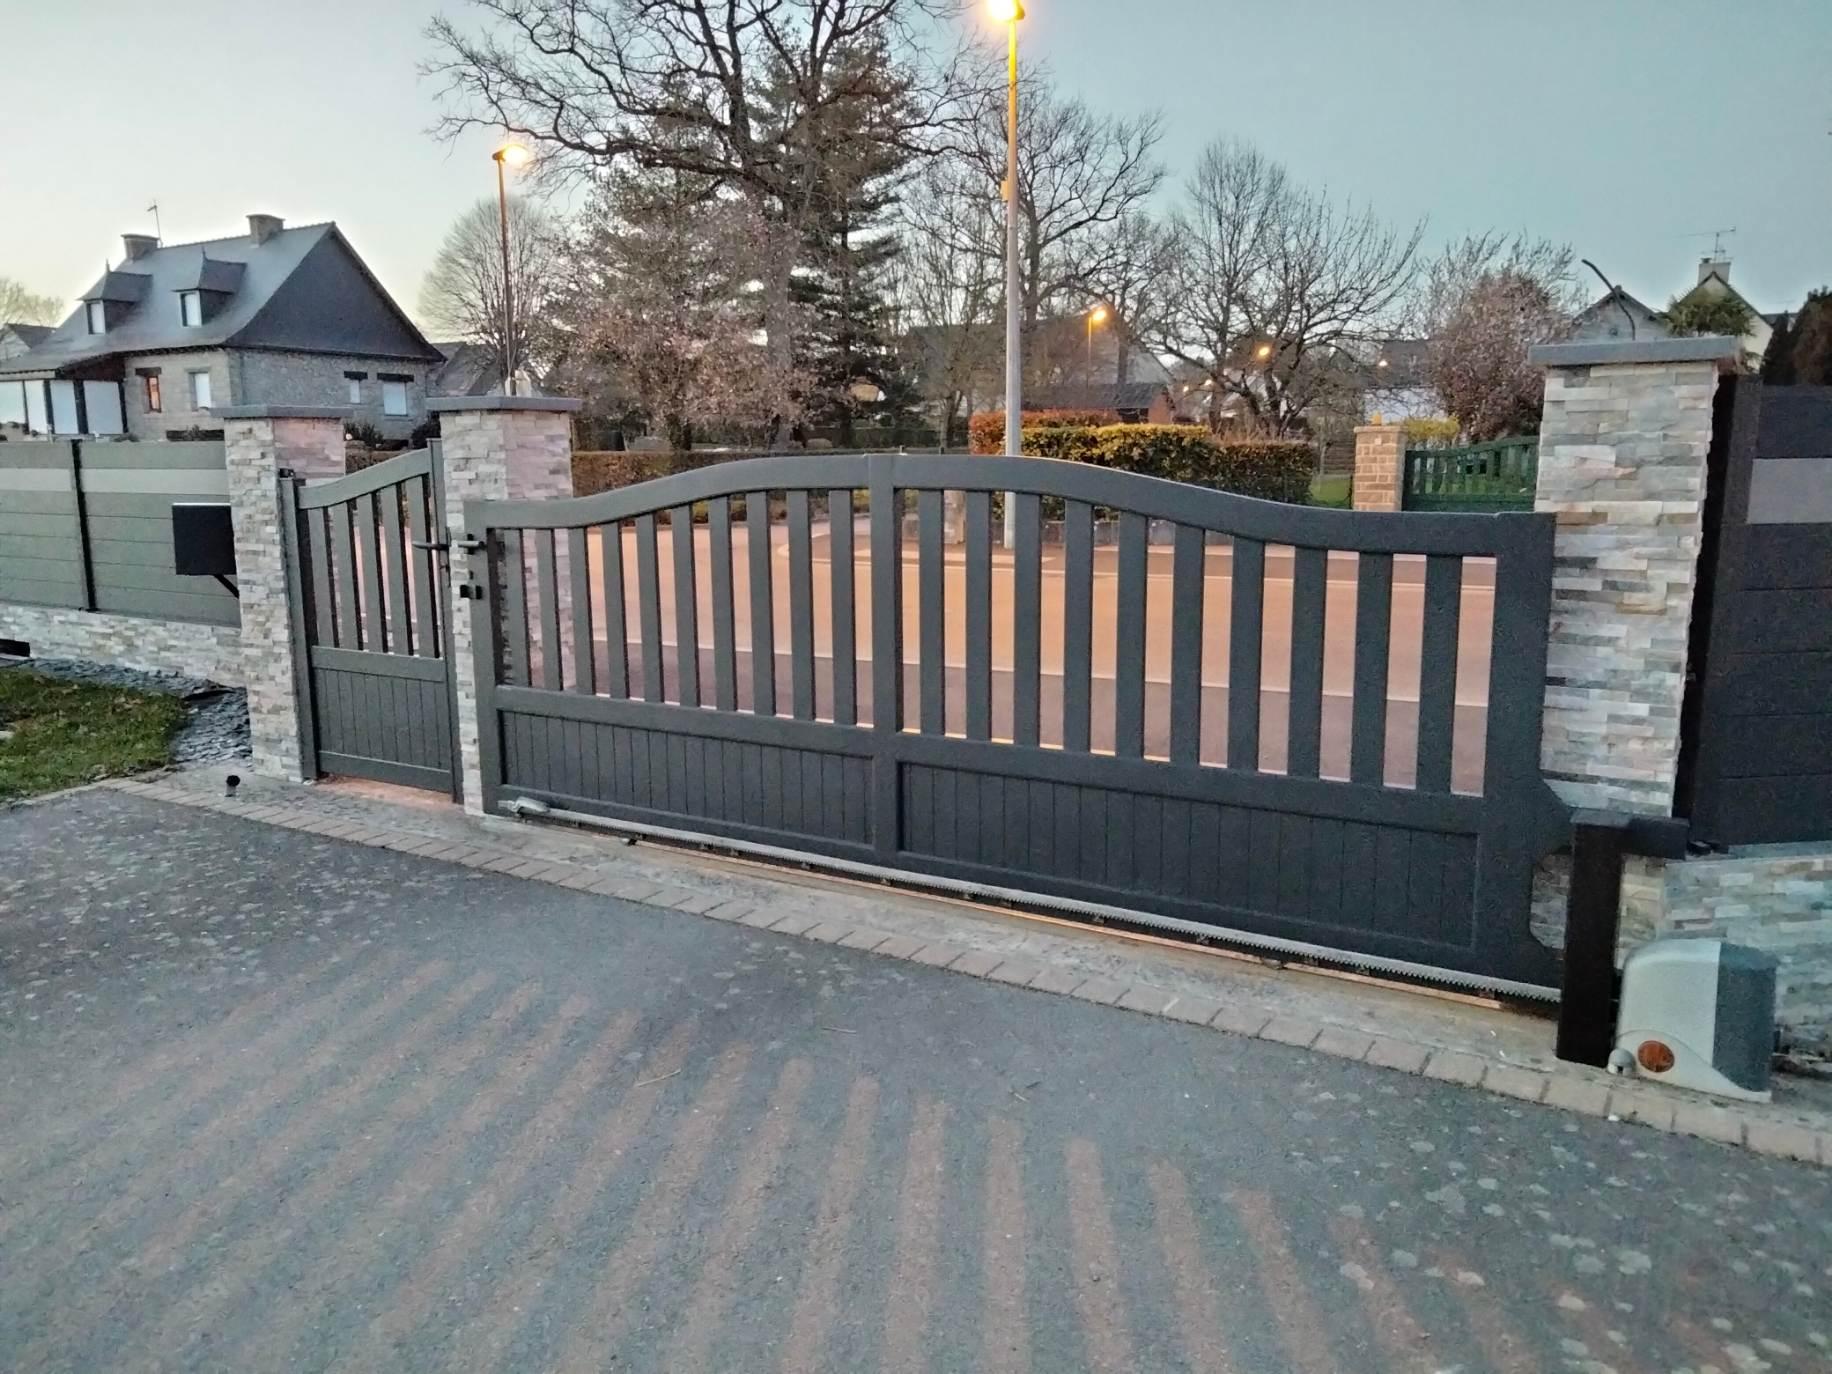 le thermolaquage du portail